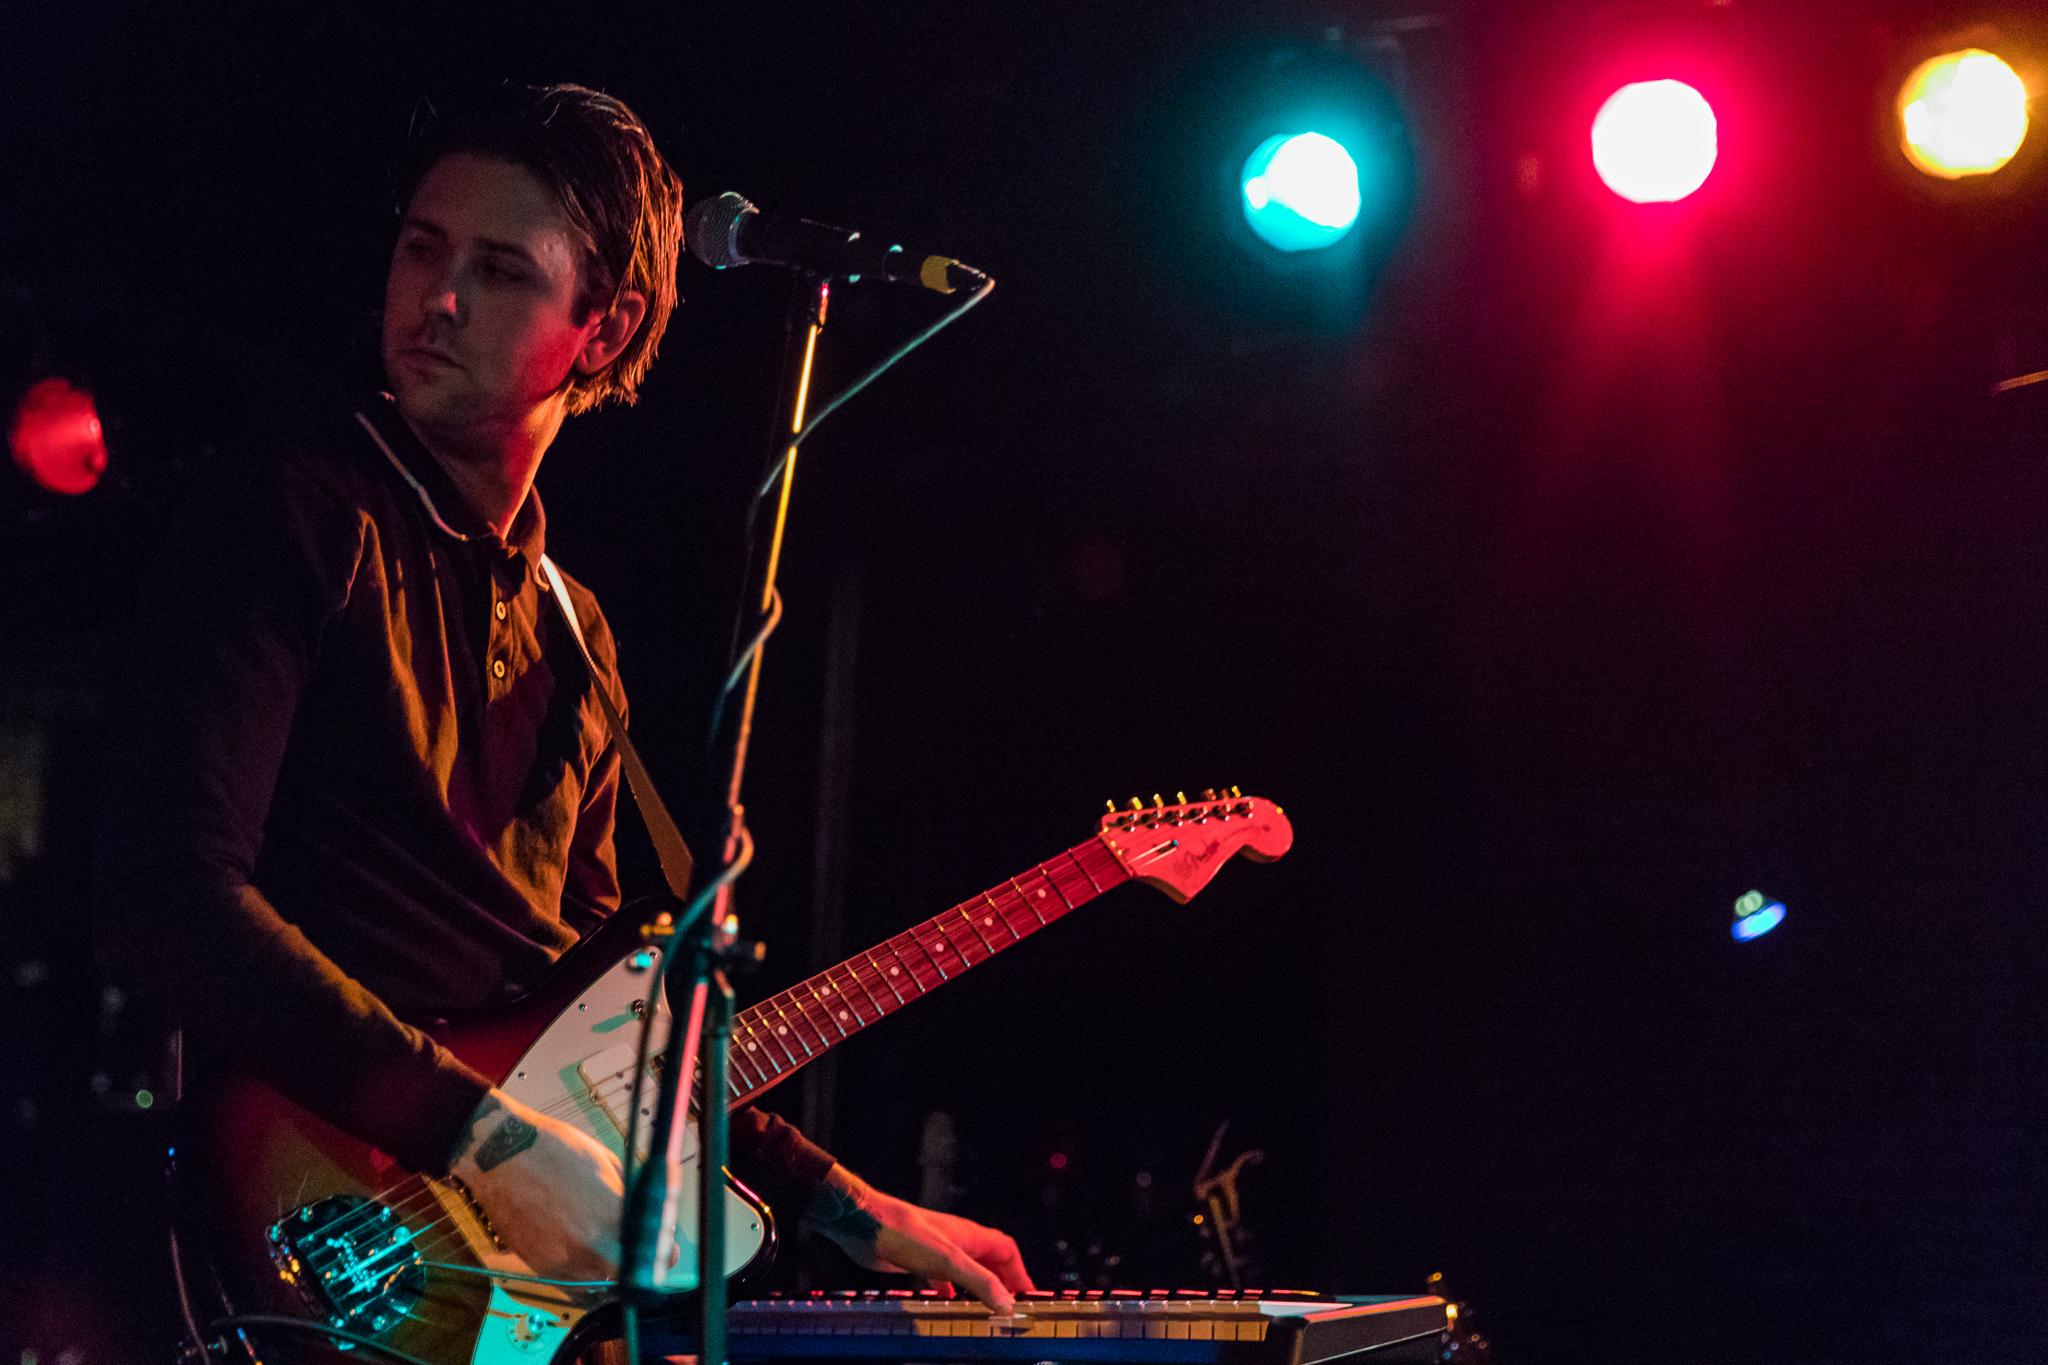 Dear Boy performing at the Black Cat in Washington, DC - 3/31/2018 (photo by Matt Condon / @arcane93)